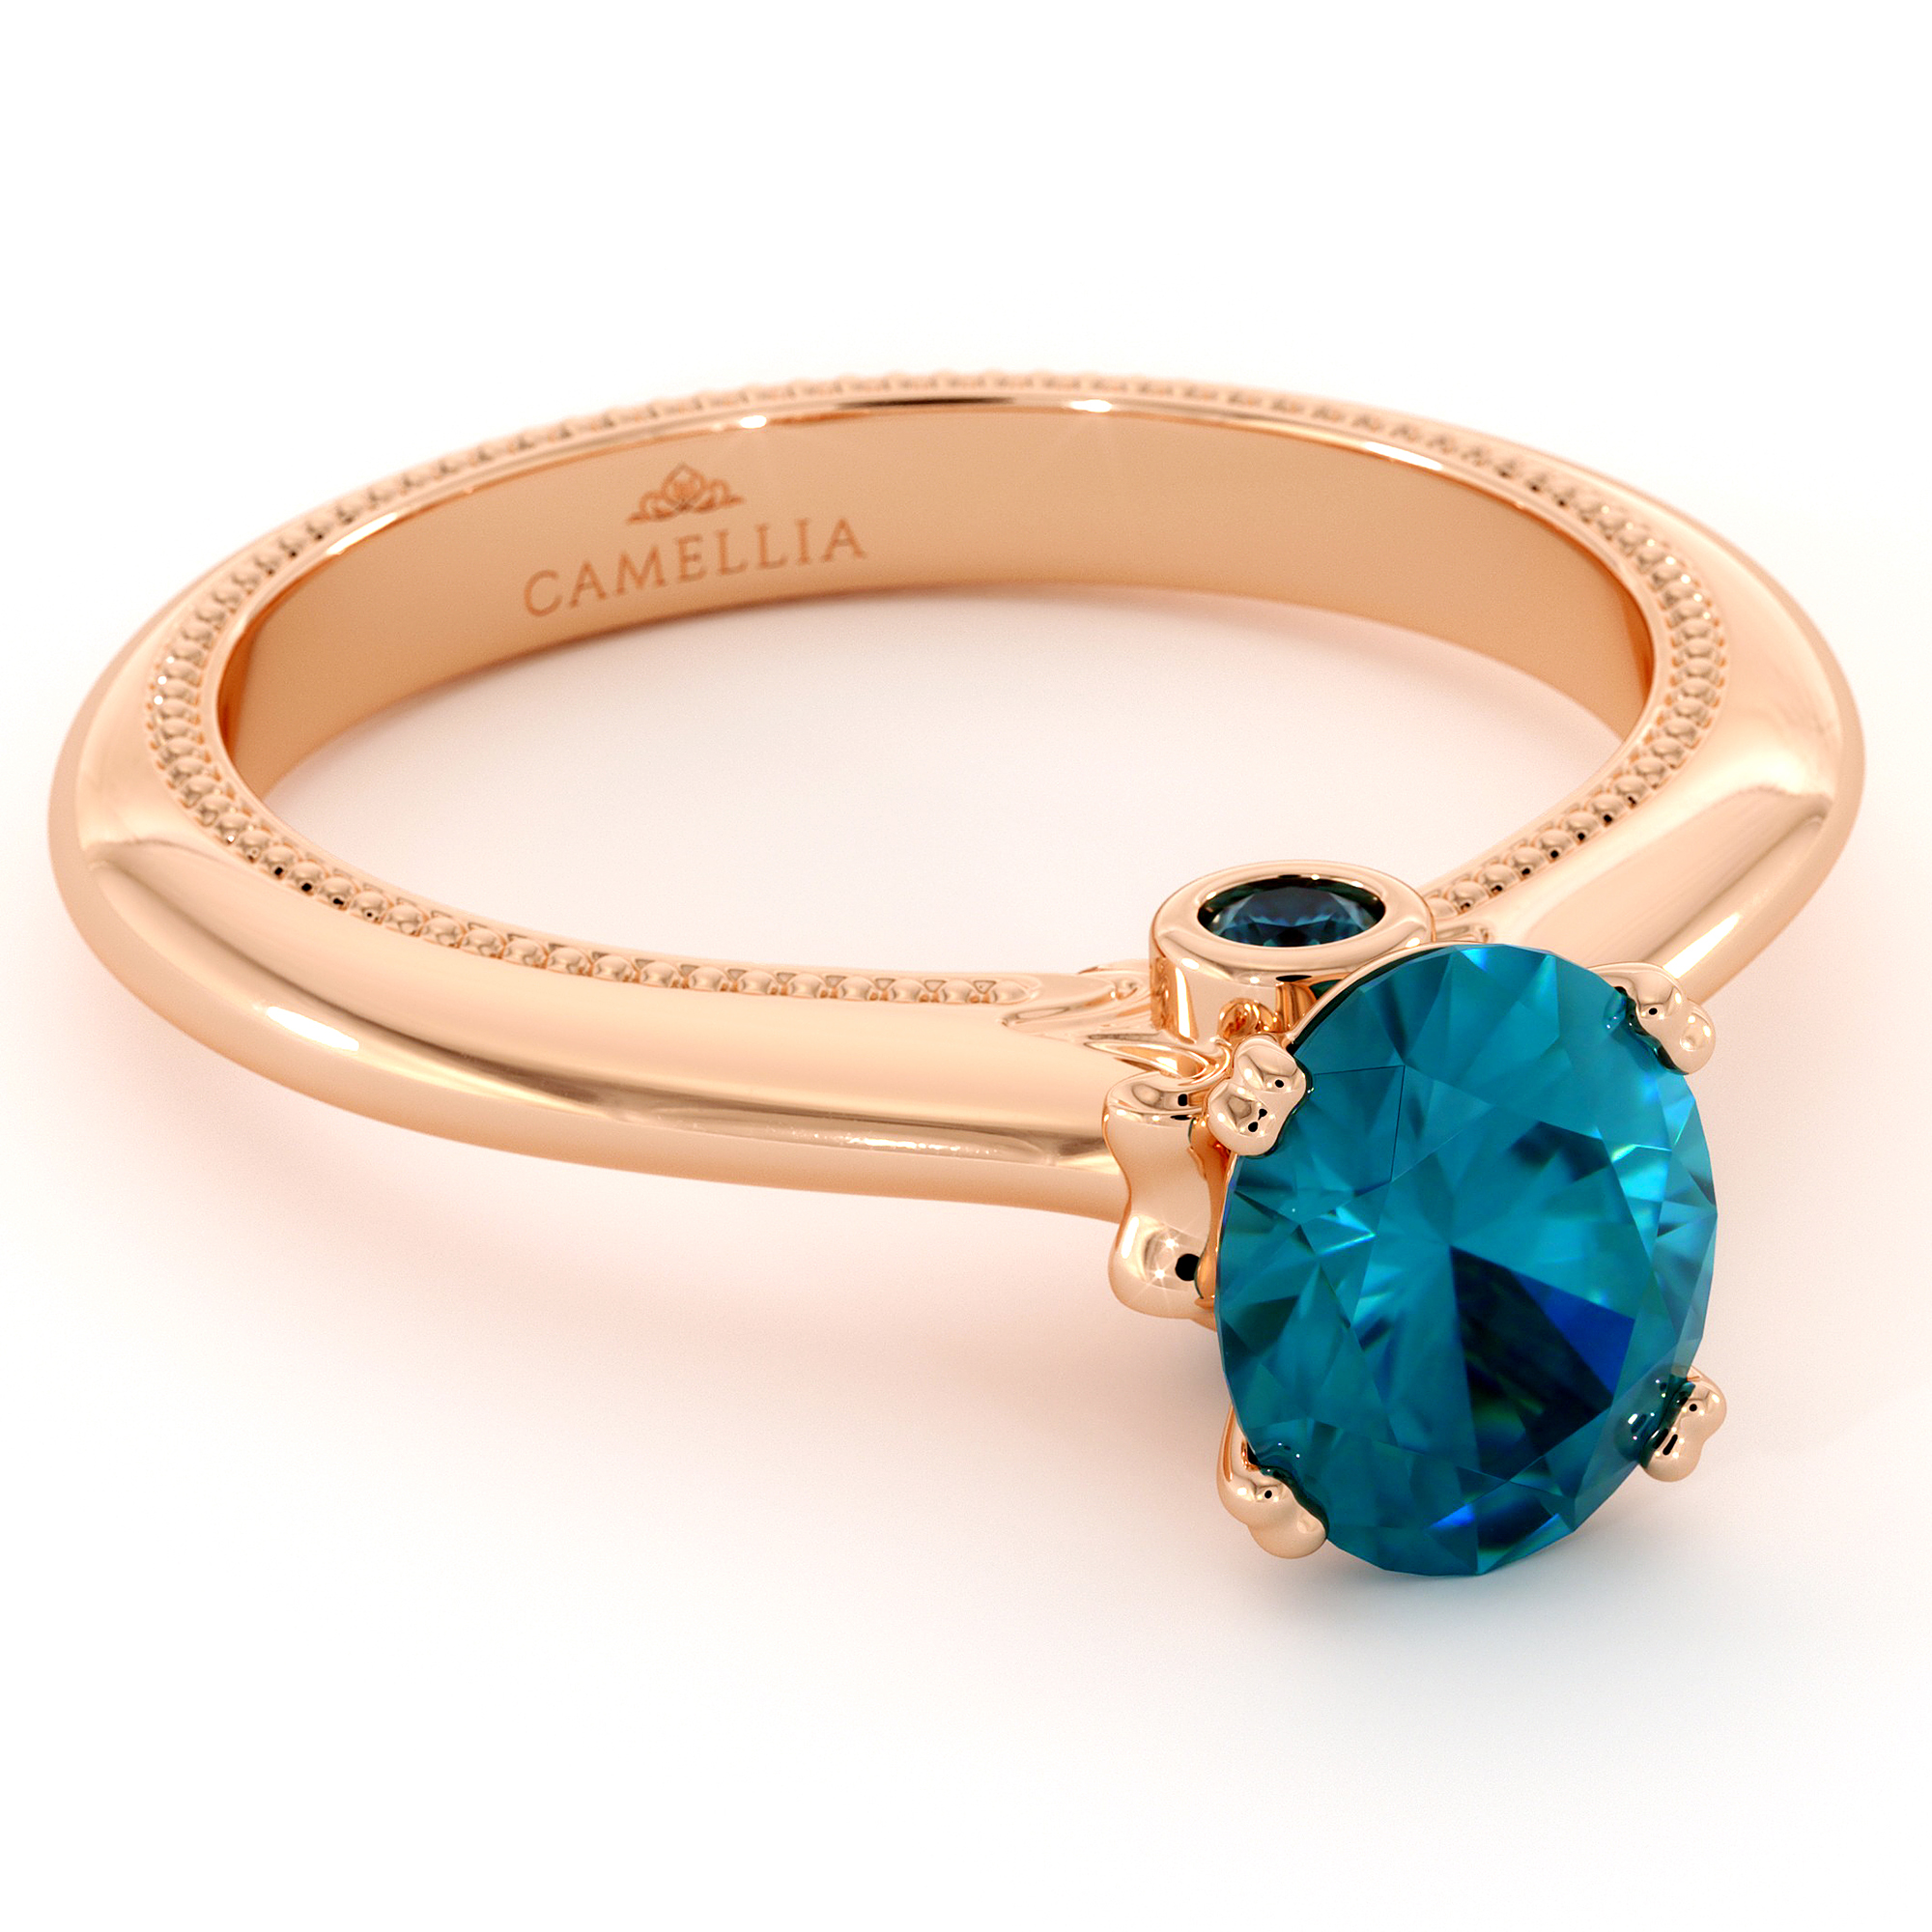 Certified Blue Diamond Engagement Ring 1.00 Cartat Oval Cut Blue Diamond 10th Anniversary Ring